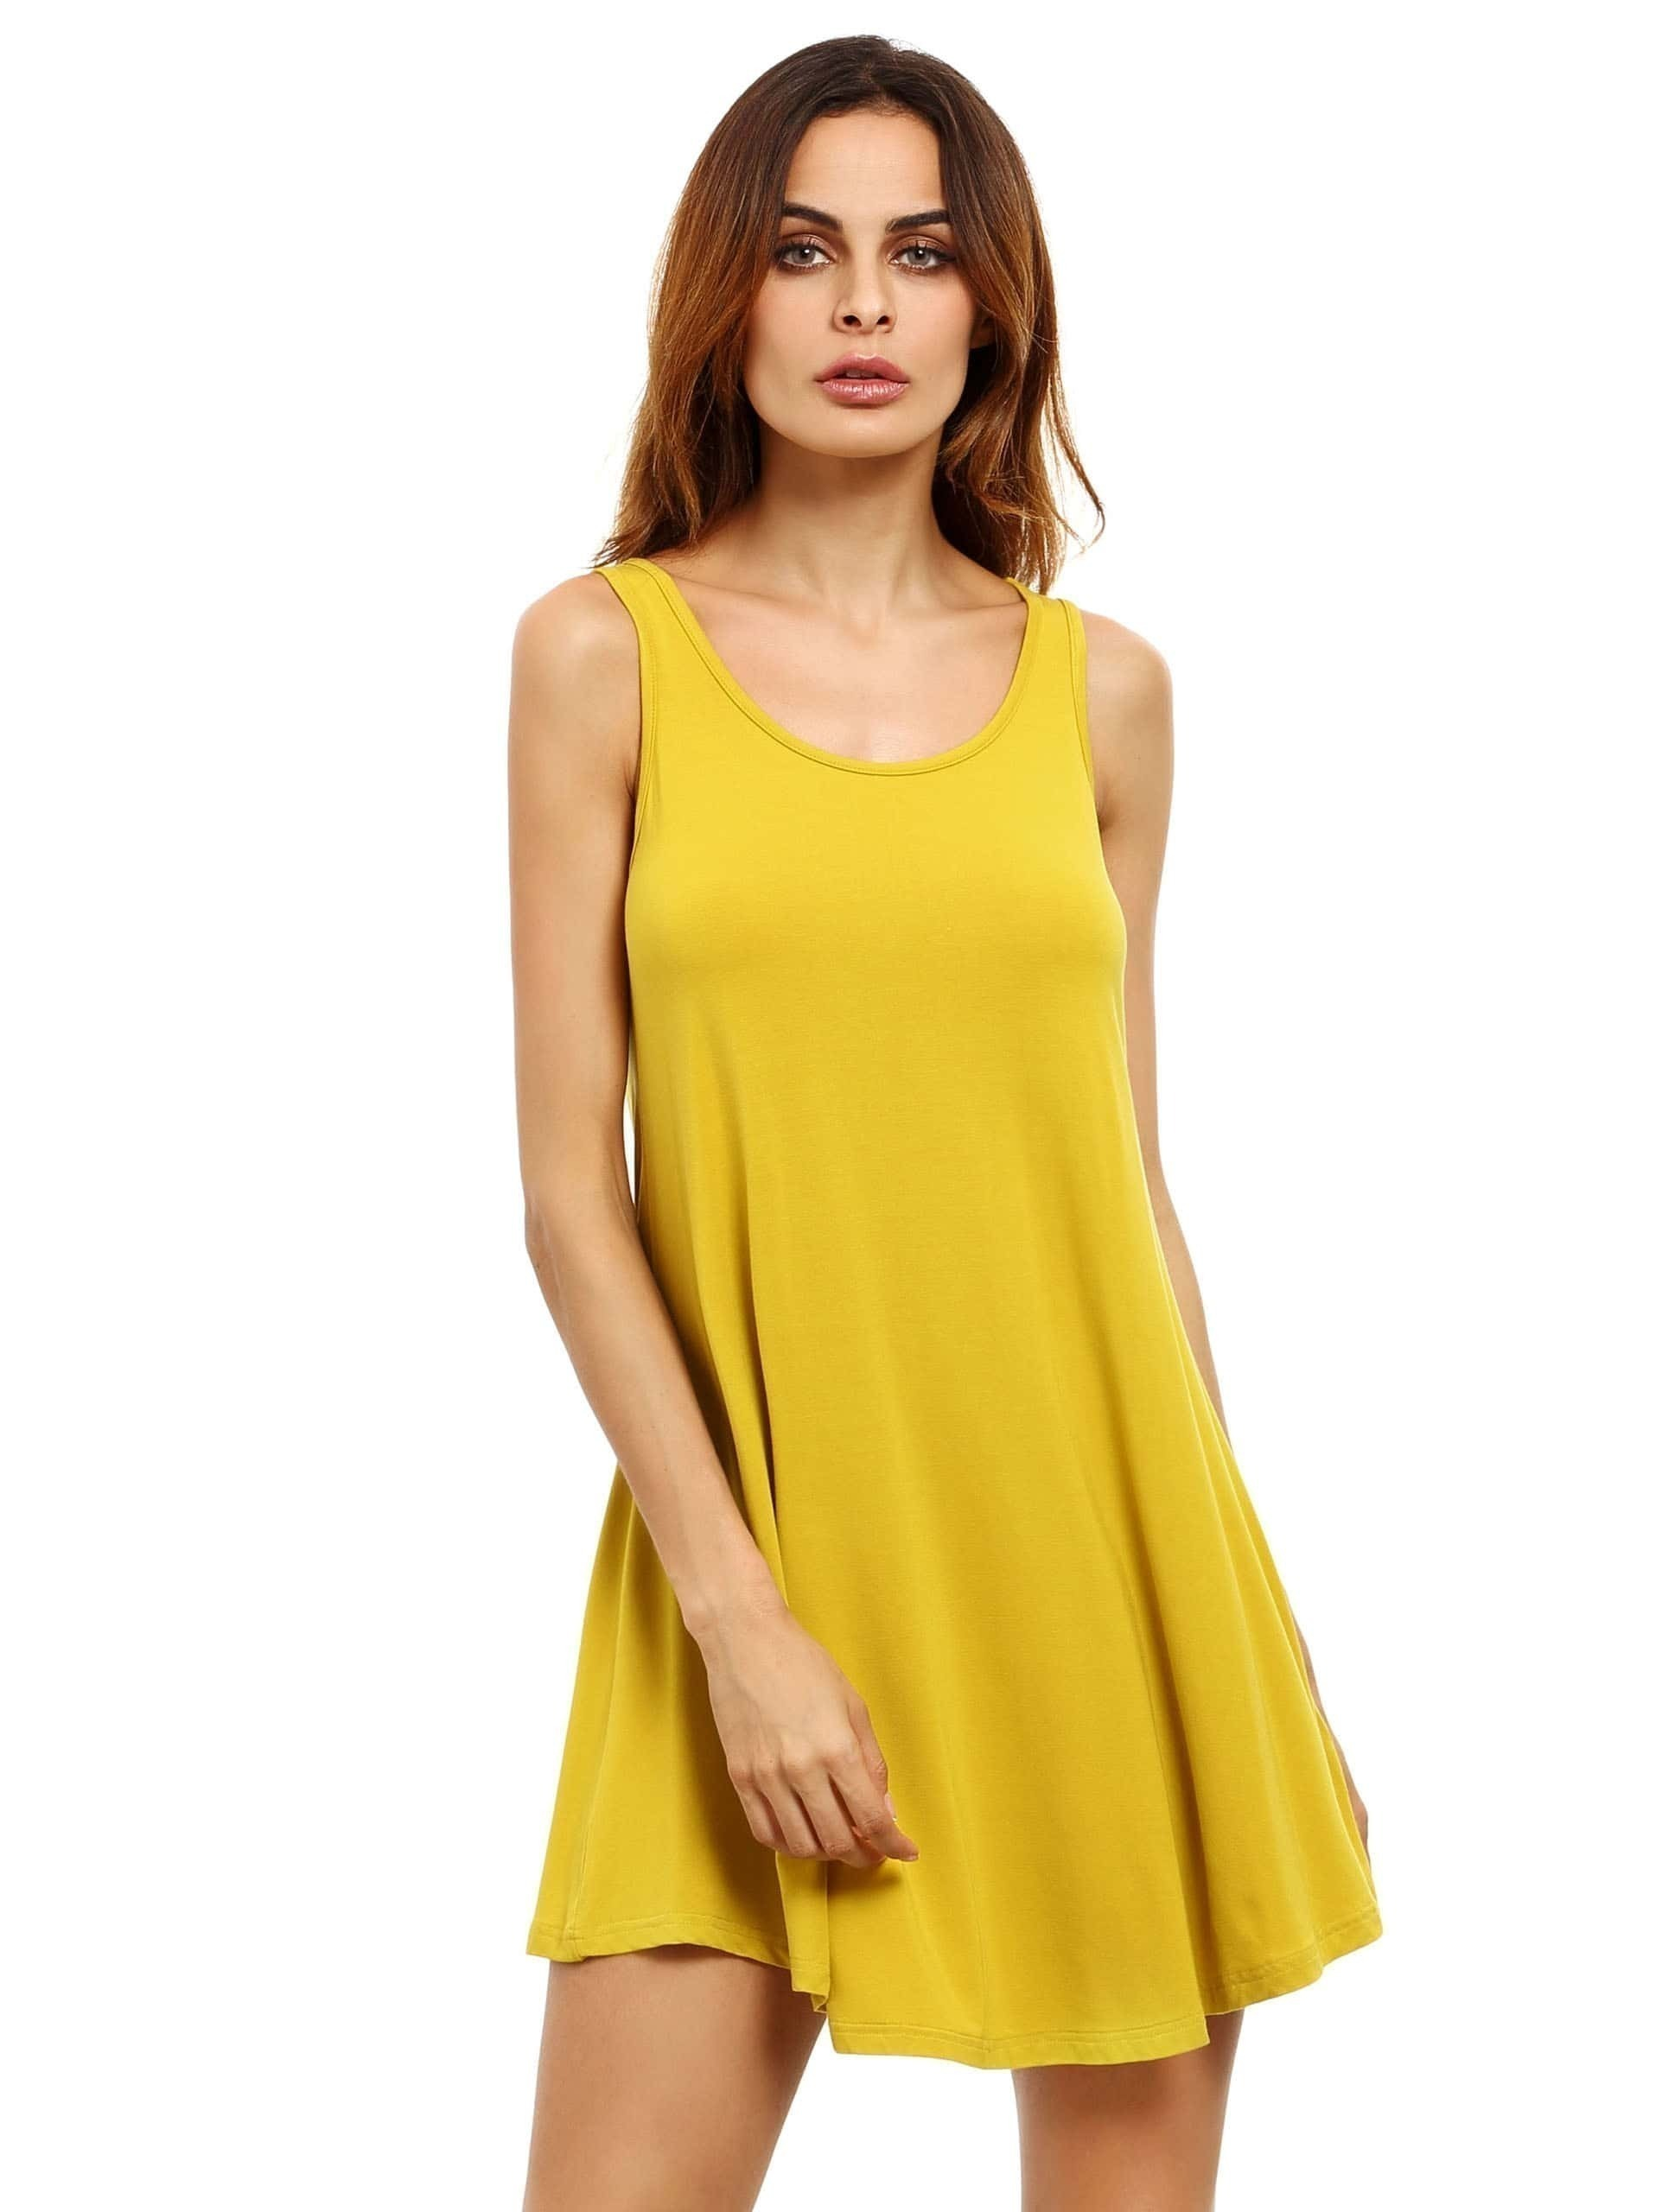 8c521c70c75 Yellow Swing Tank Dress EmmaCloth-Women Fast Fashion Online